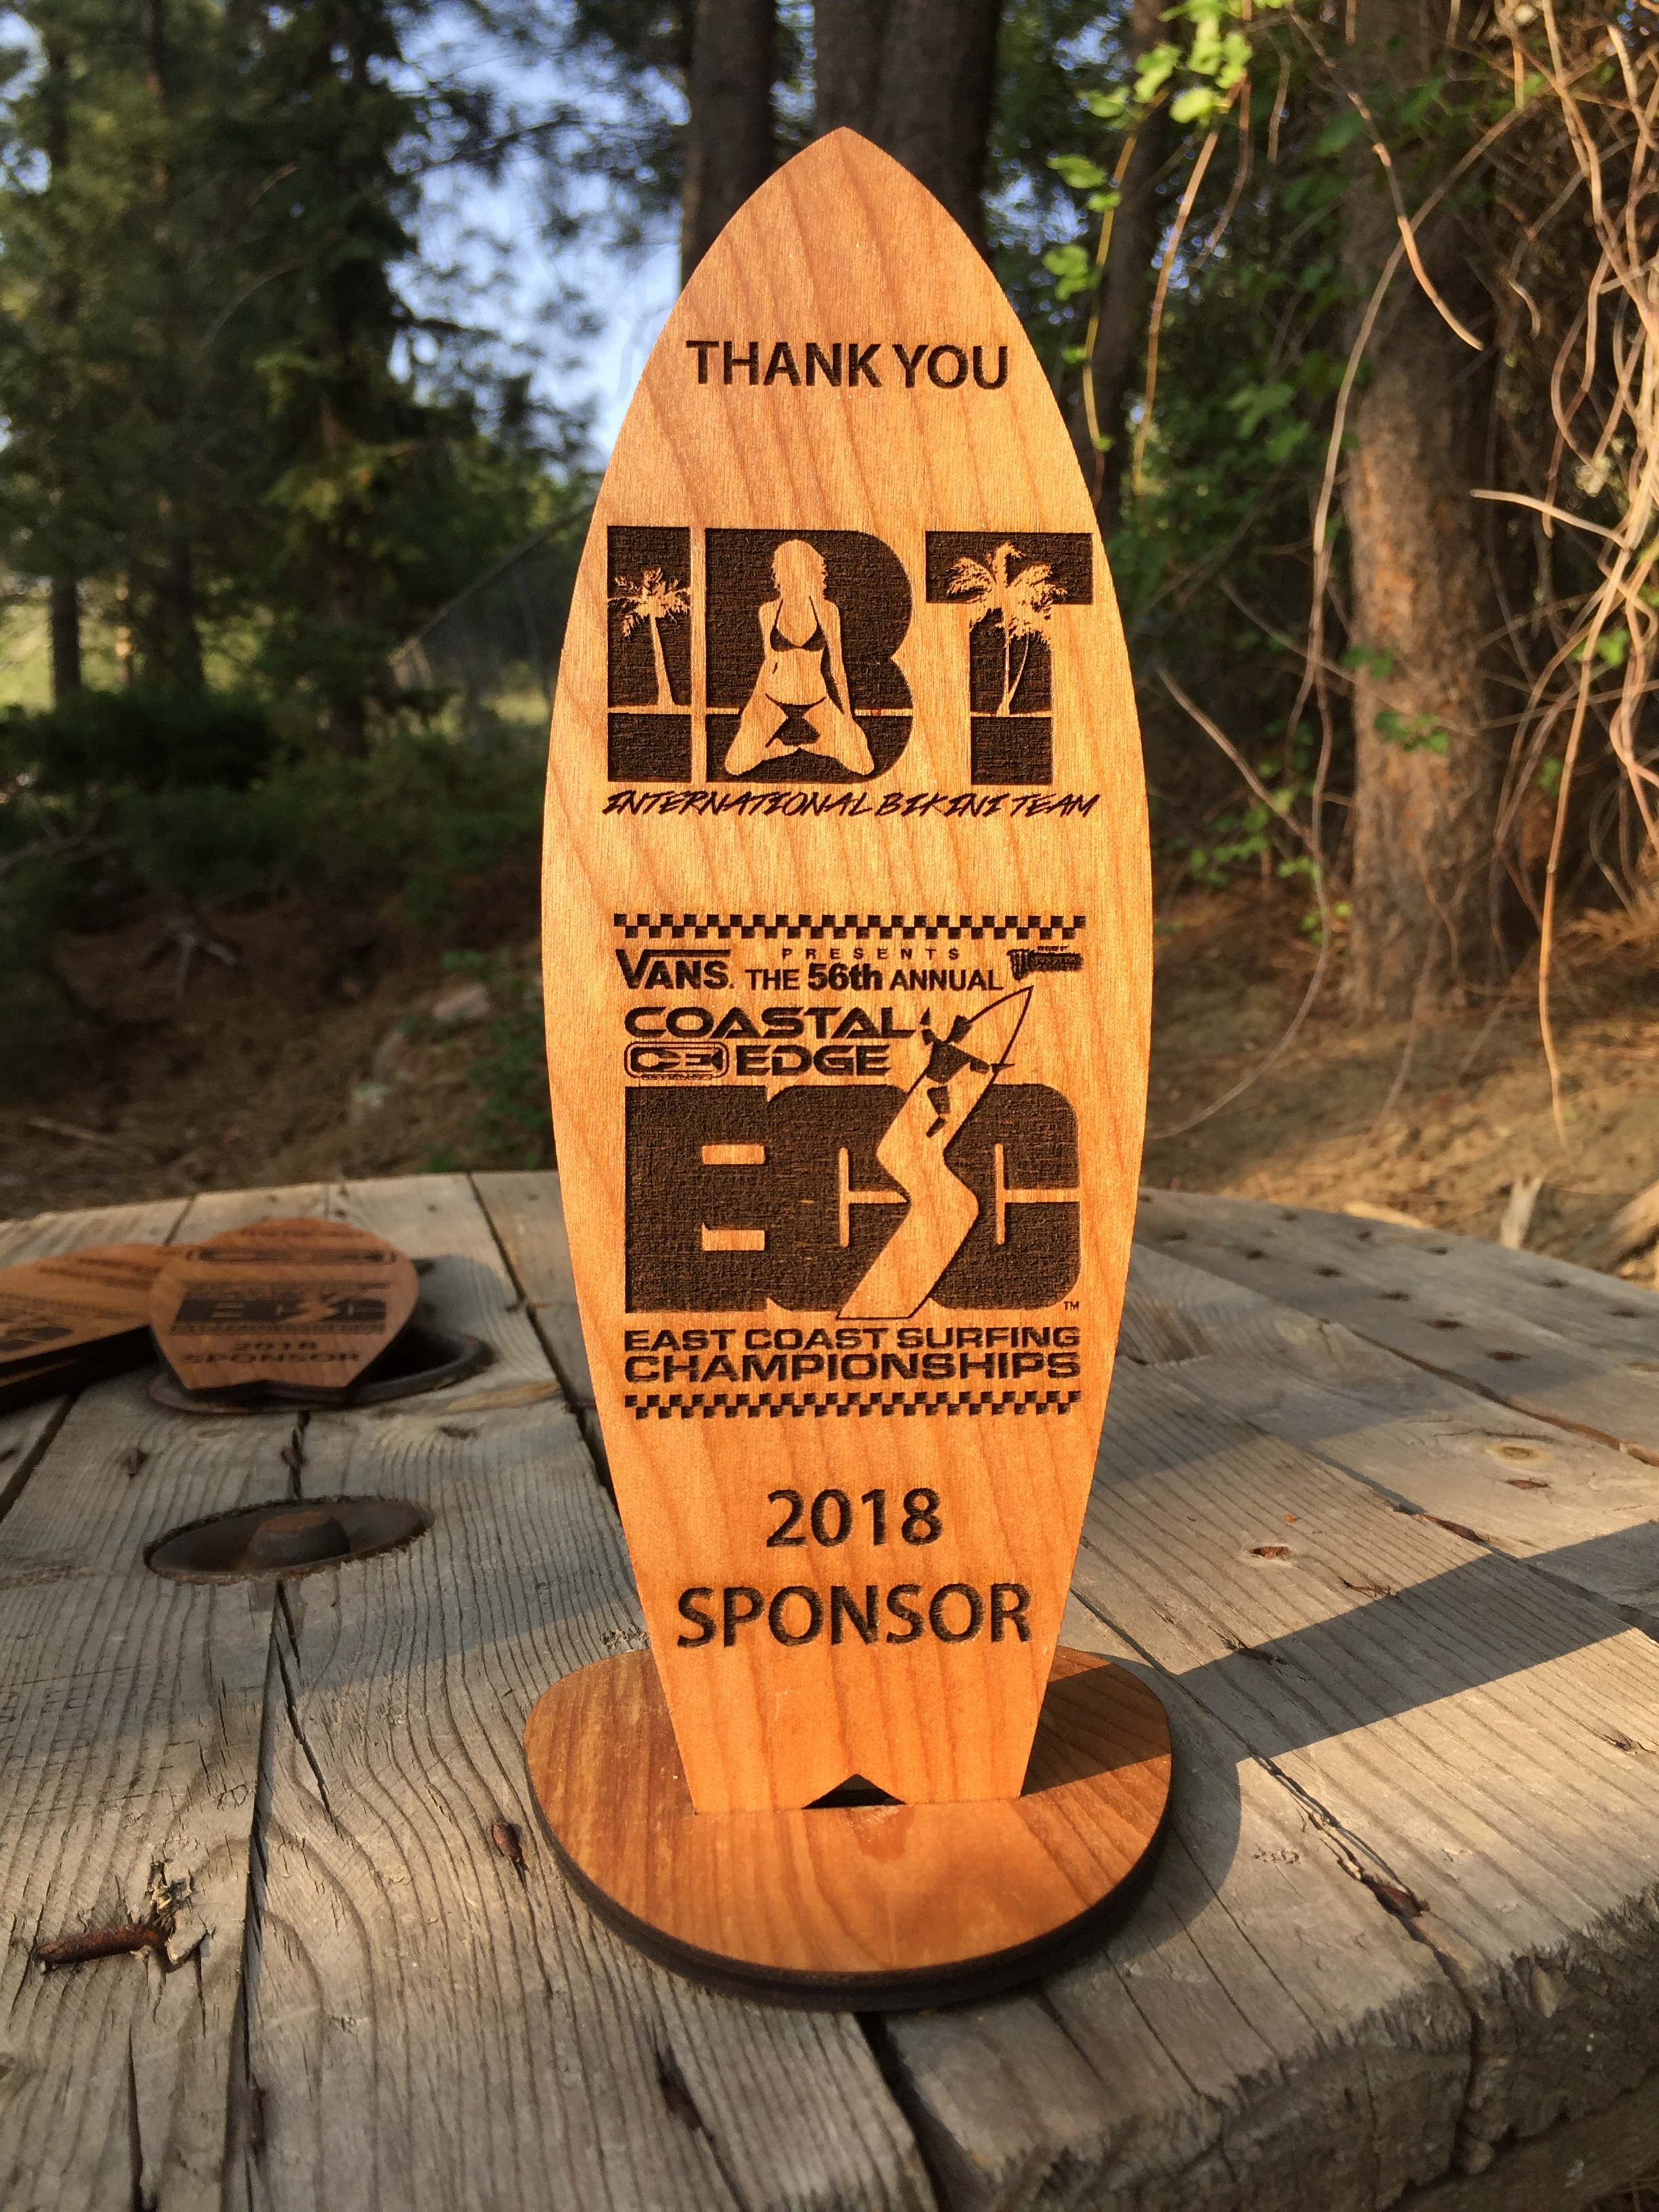 Wooden Surfboard Trophies & Awards